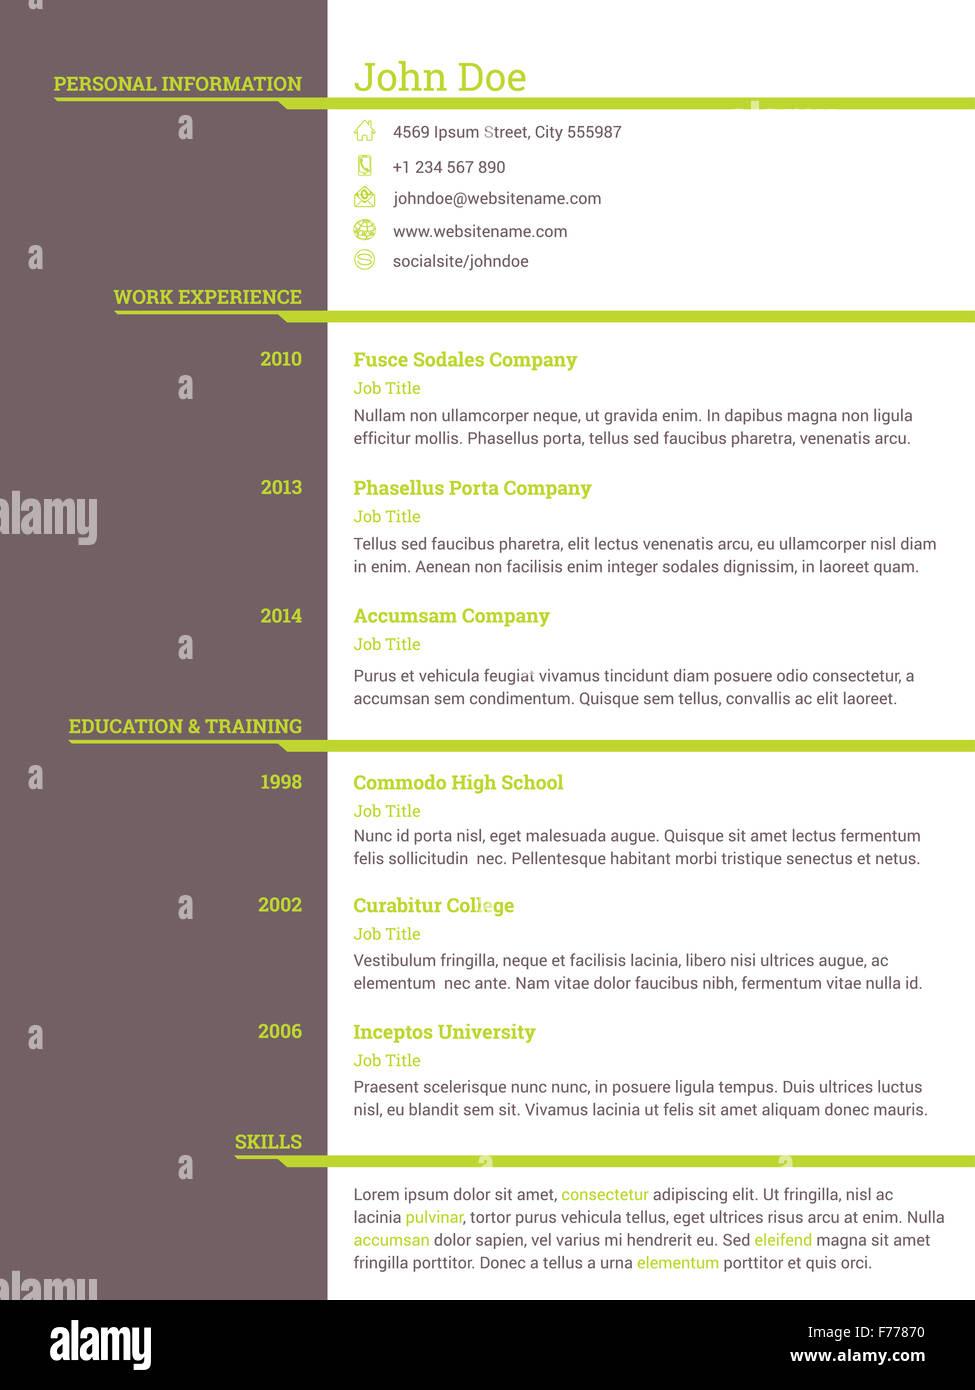 Modern Resume Cv Curriculum Vitae Template Design For Job Seekers